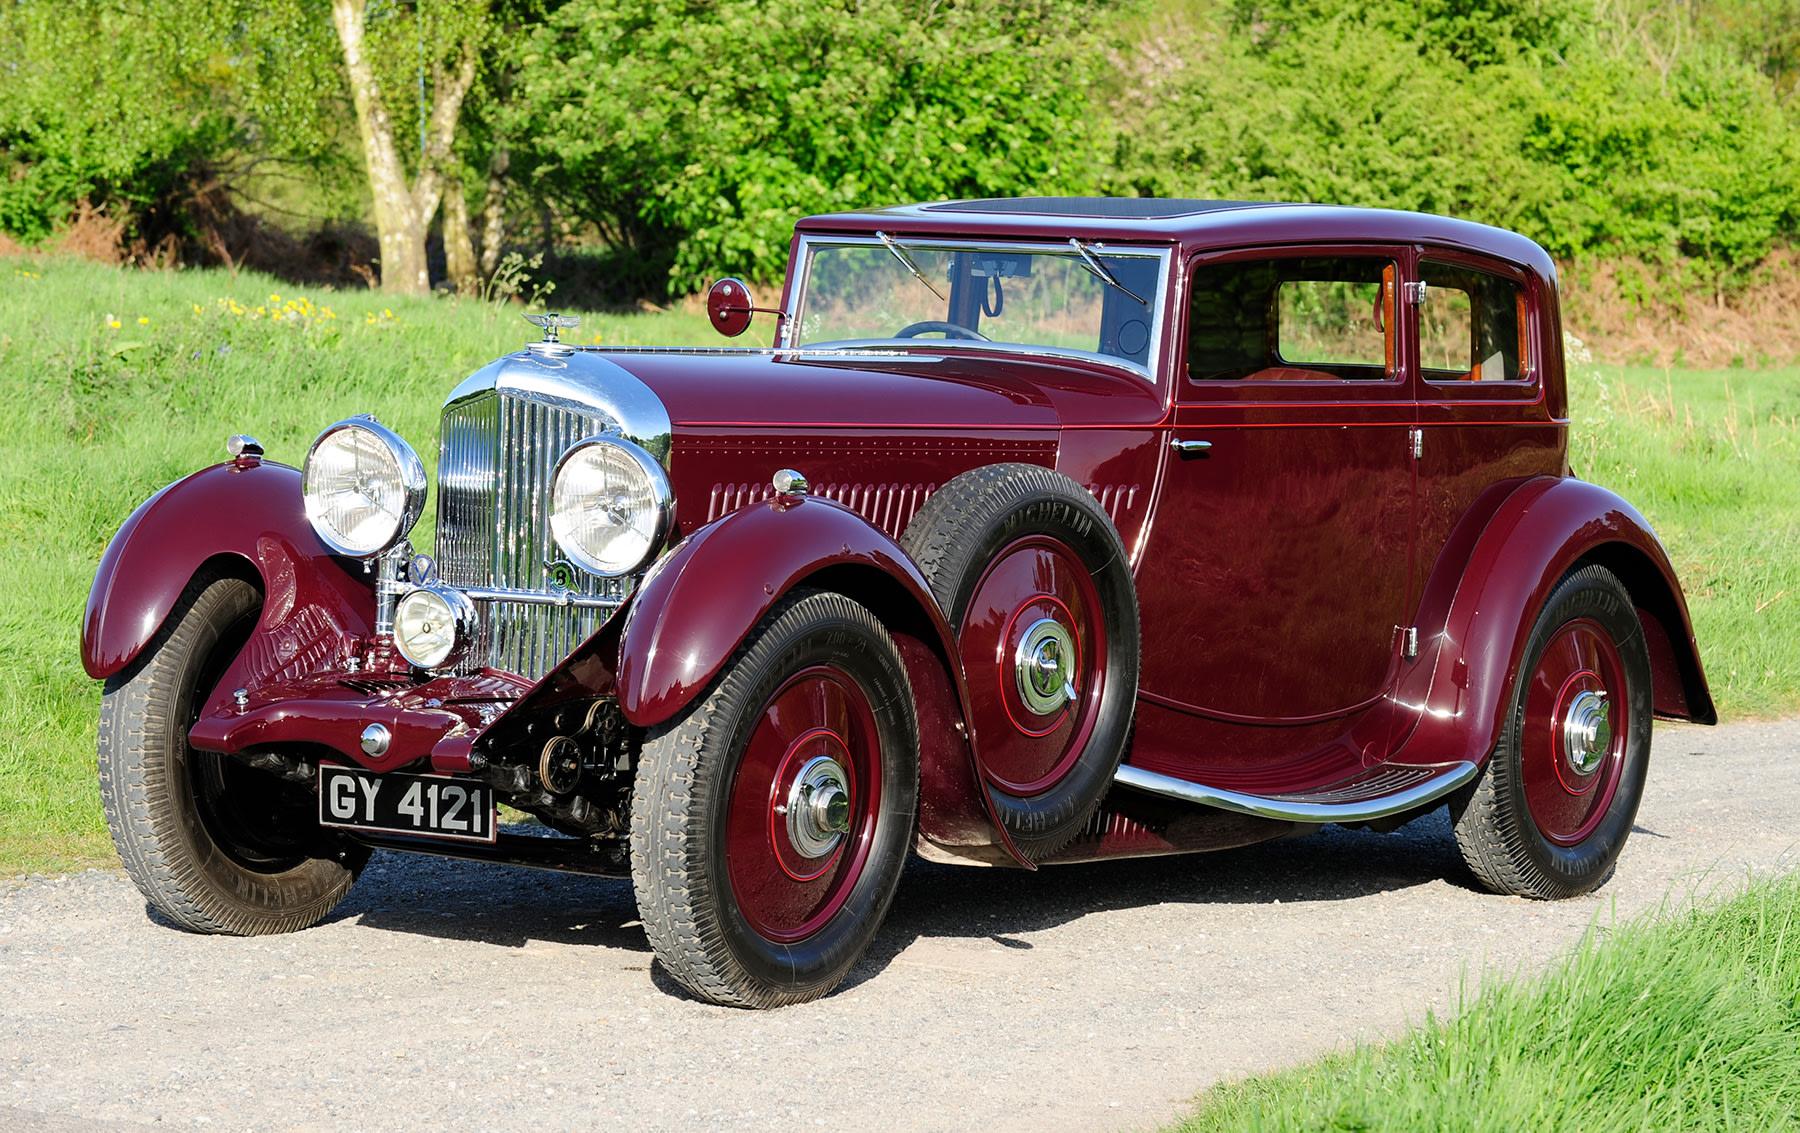 1931 Bentley 8 Litre Sportsman's Coupe